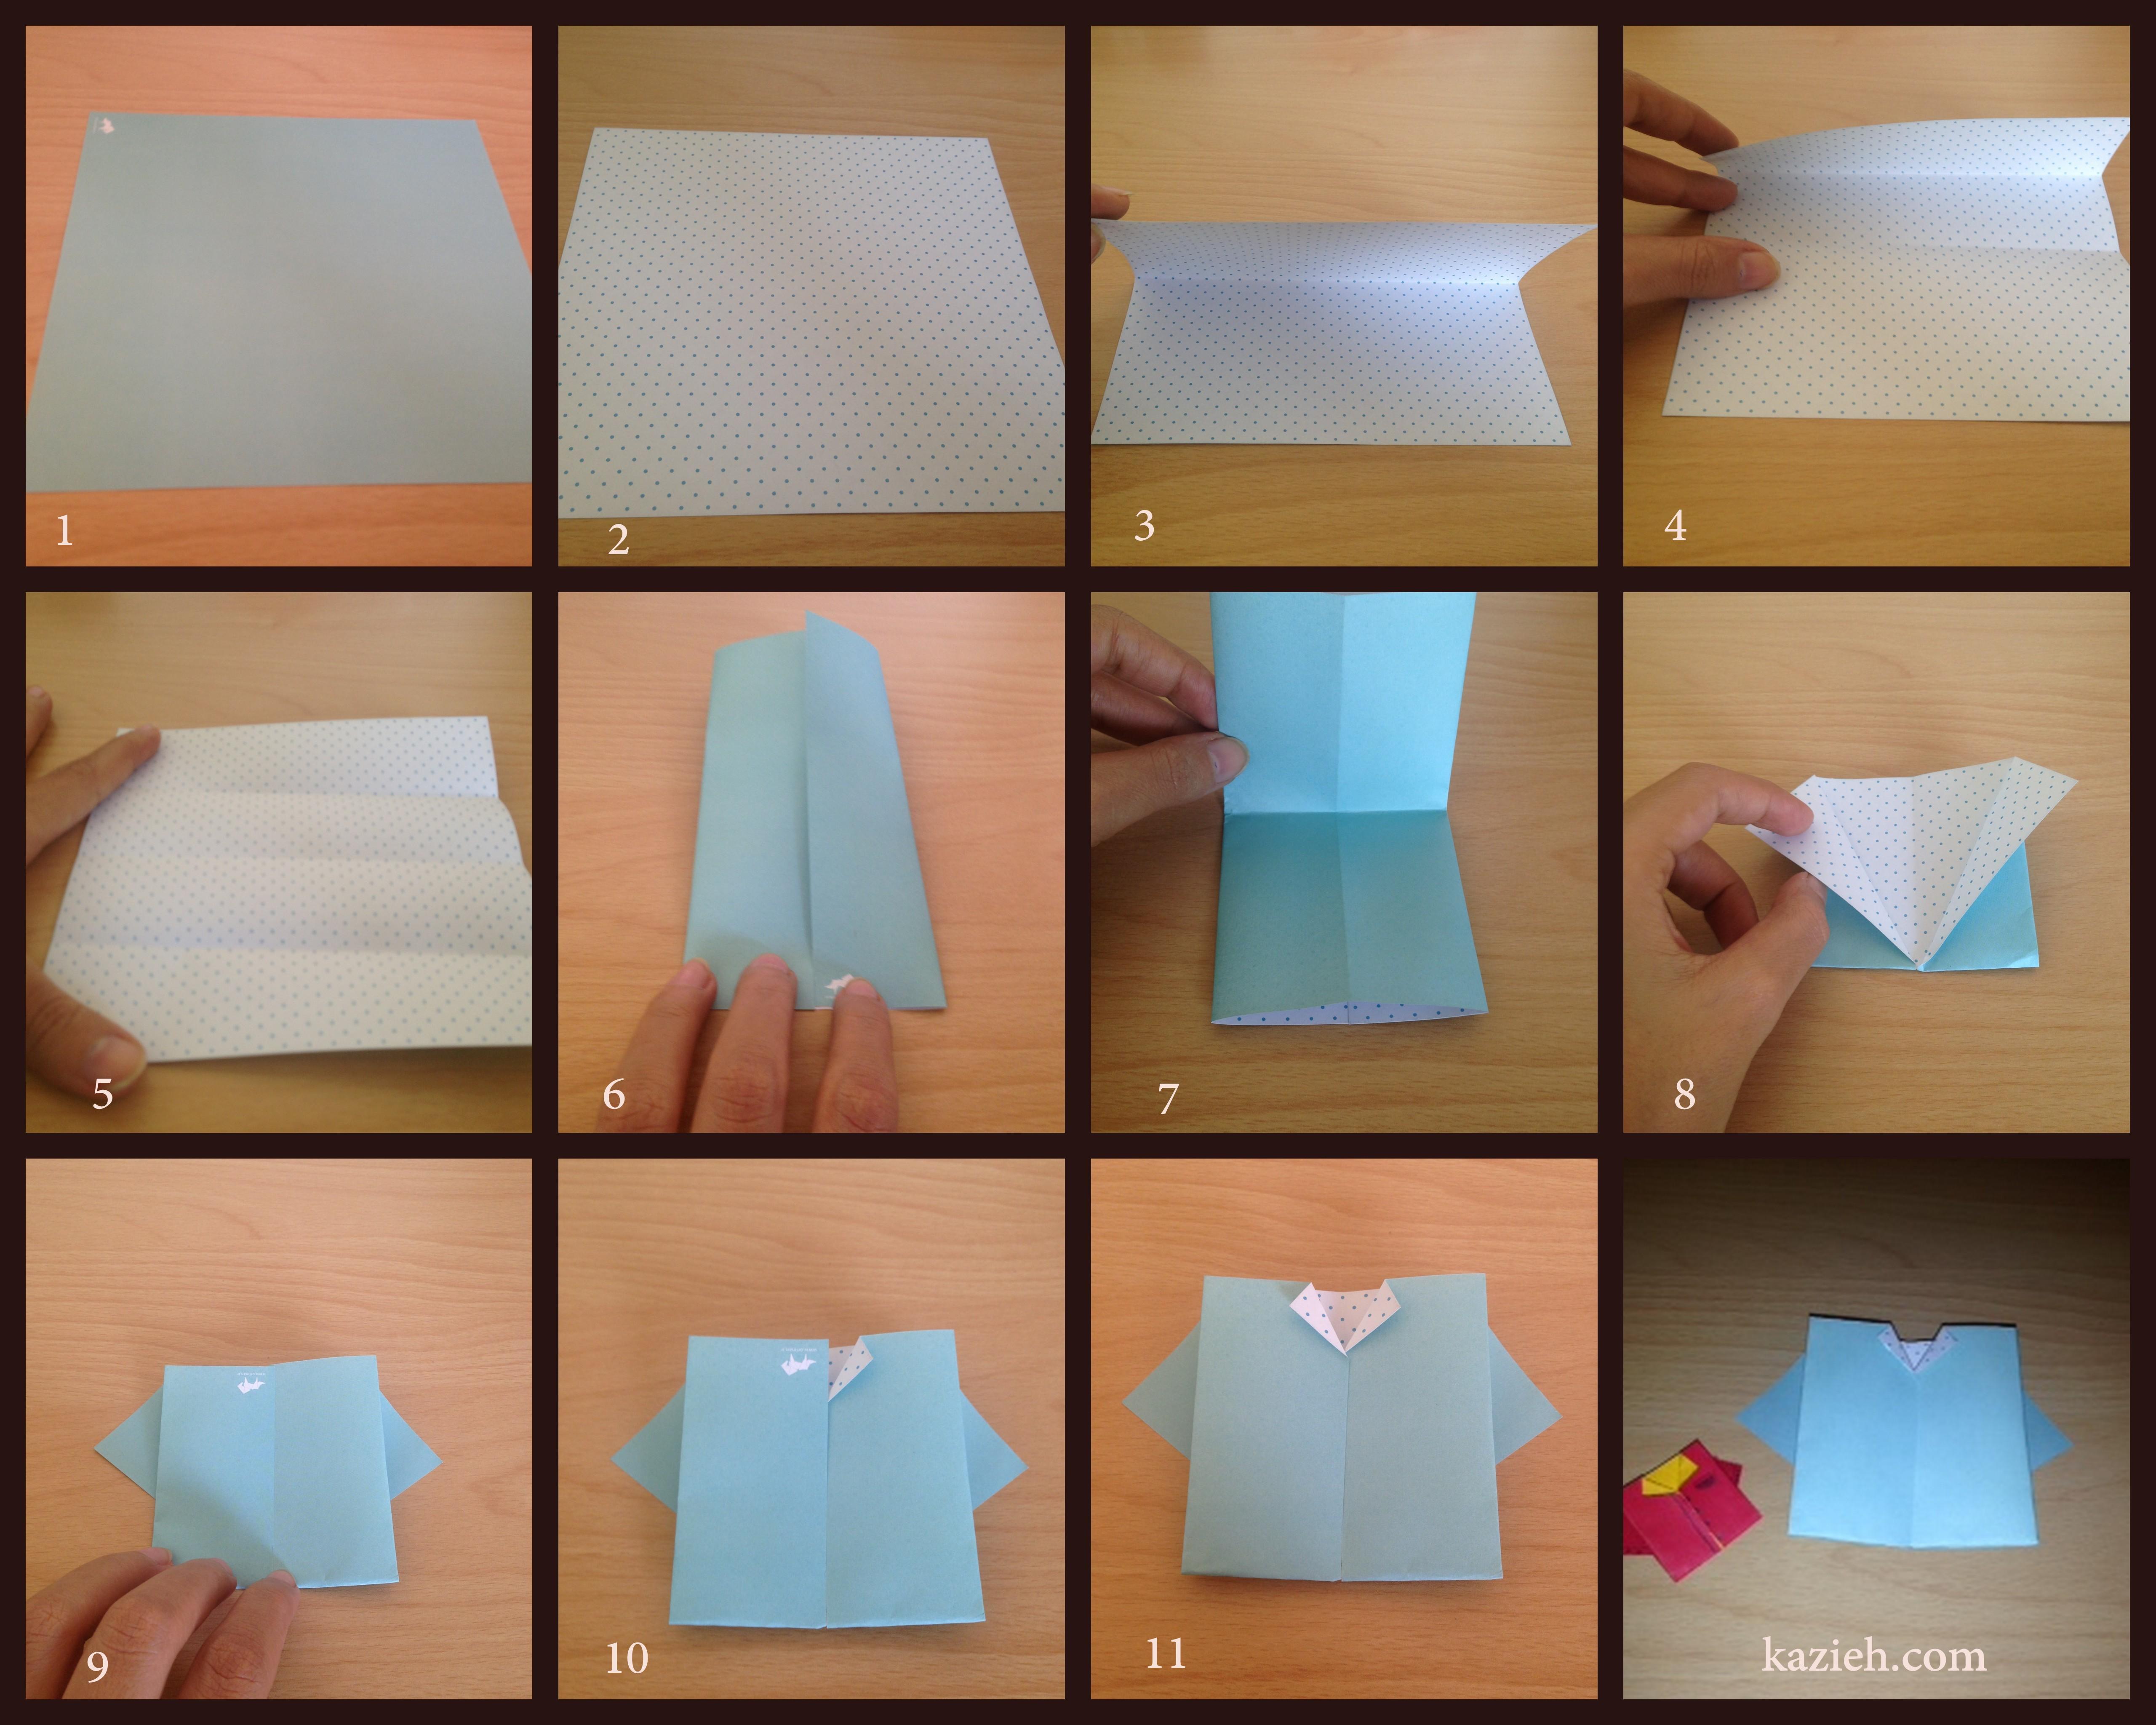 آموزش تیشرت اوریگامی - آموزش تیشرت اریگامی